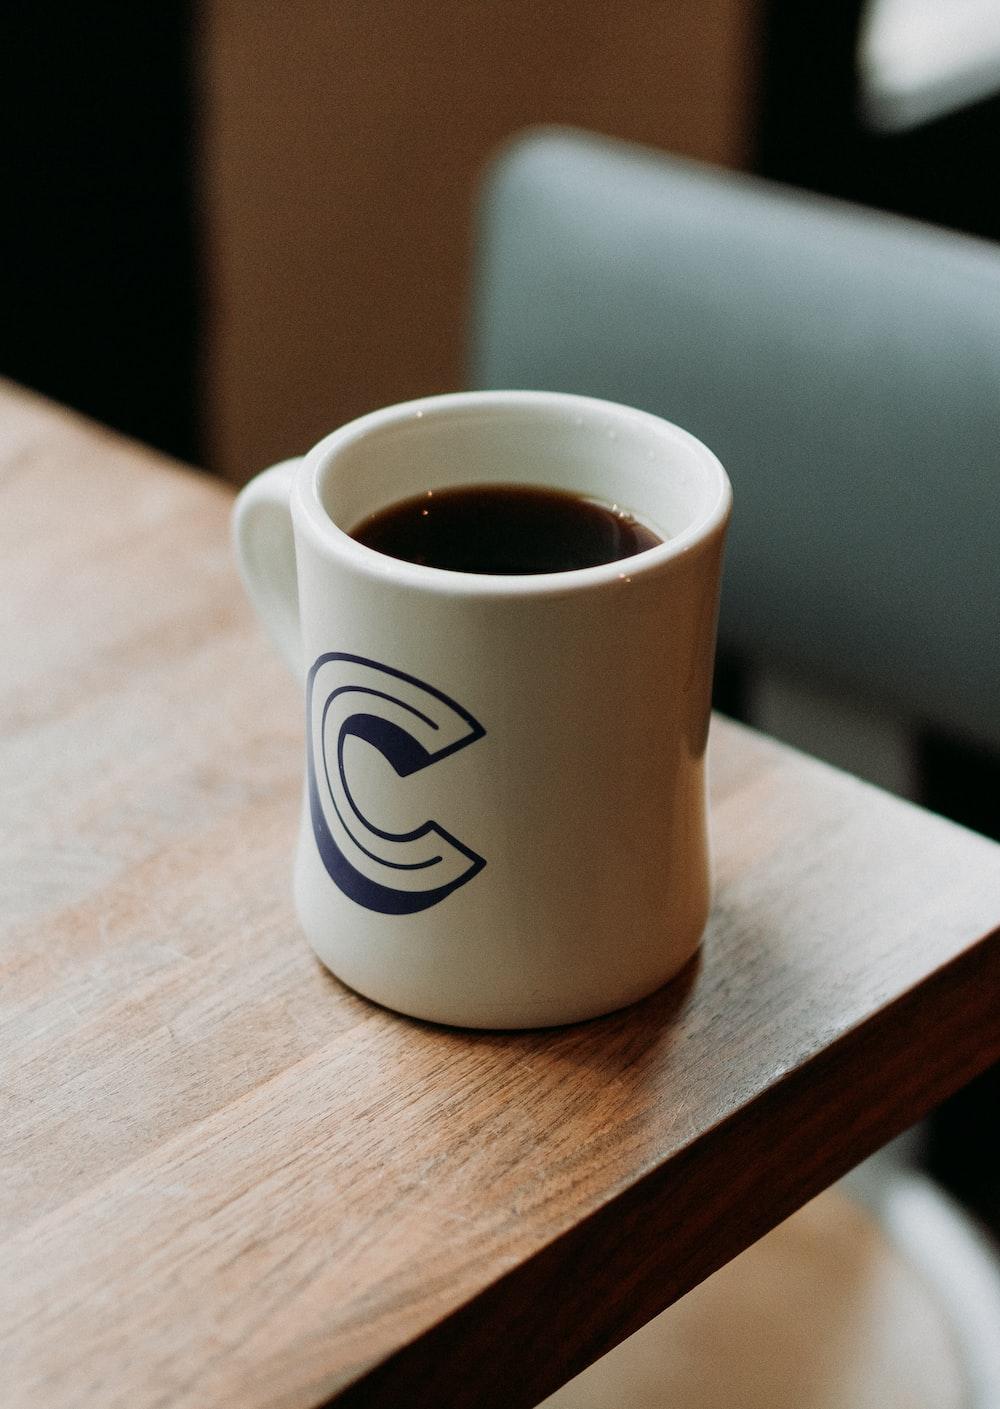 white ceramic mug with black liquid on table